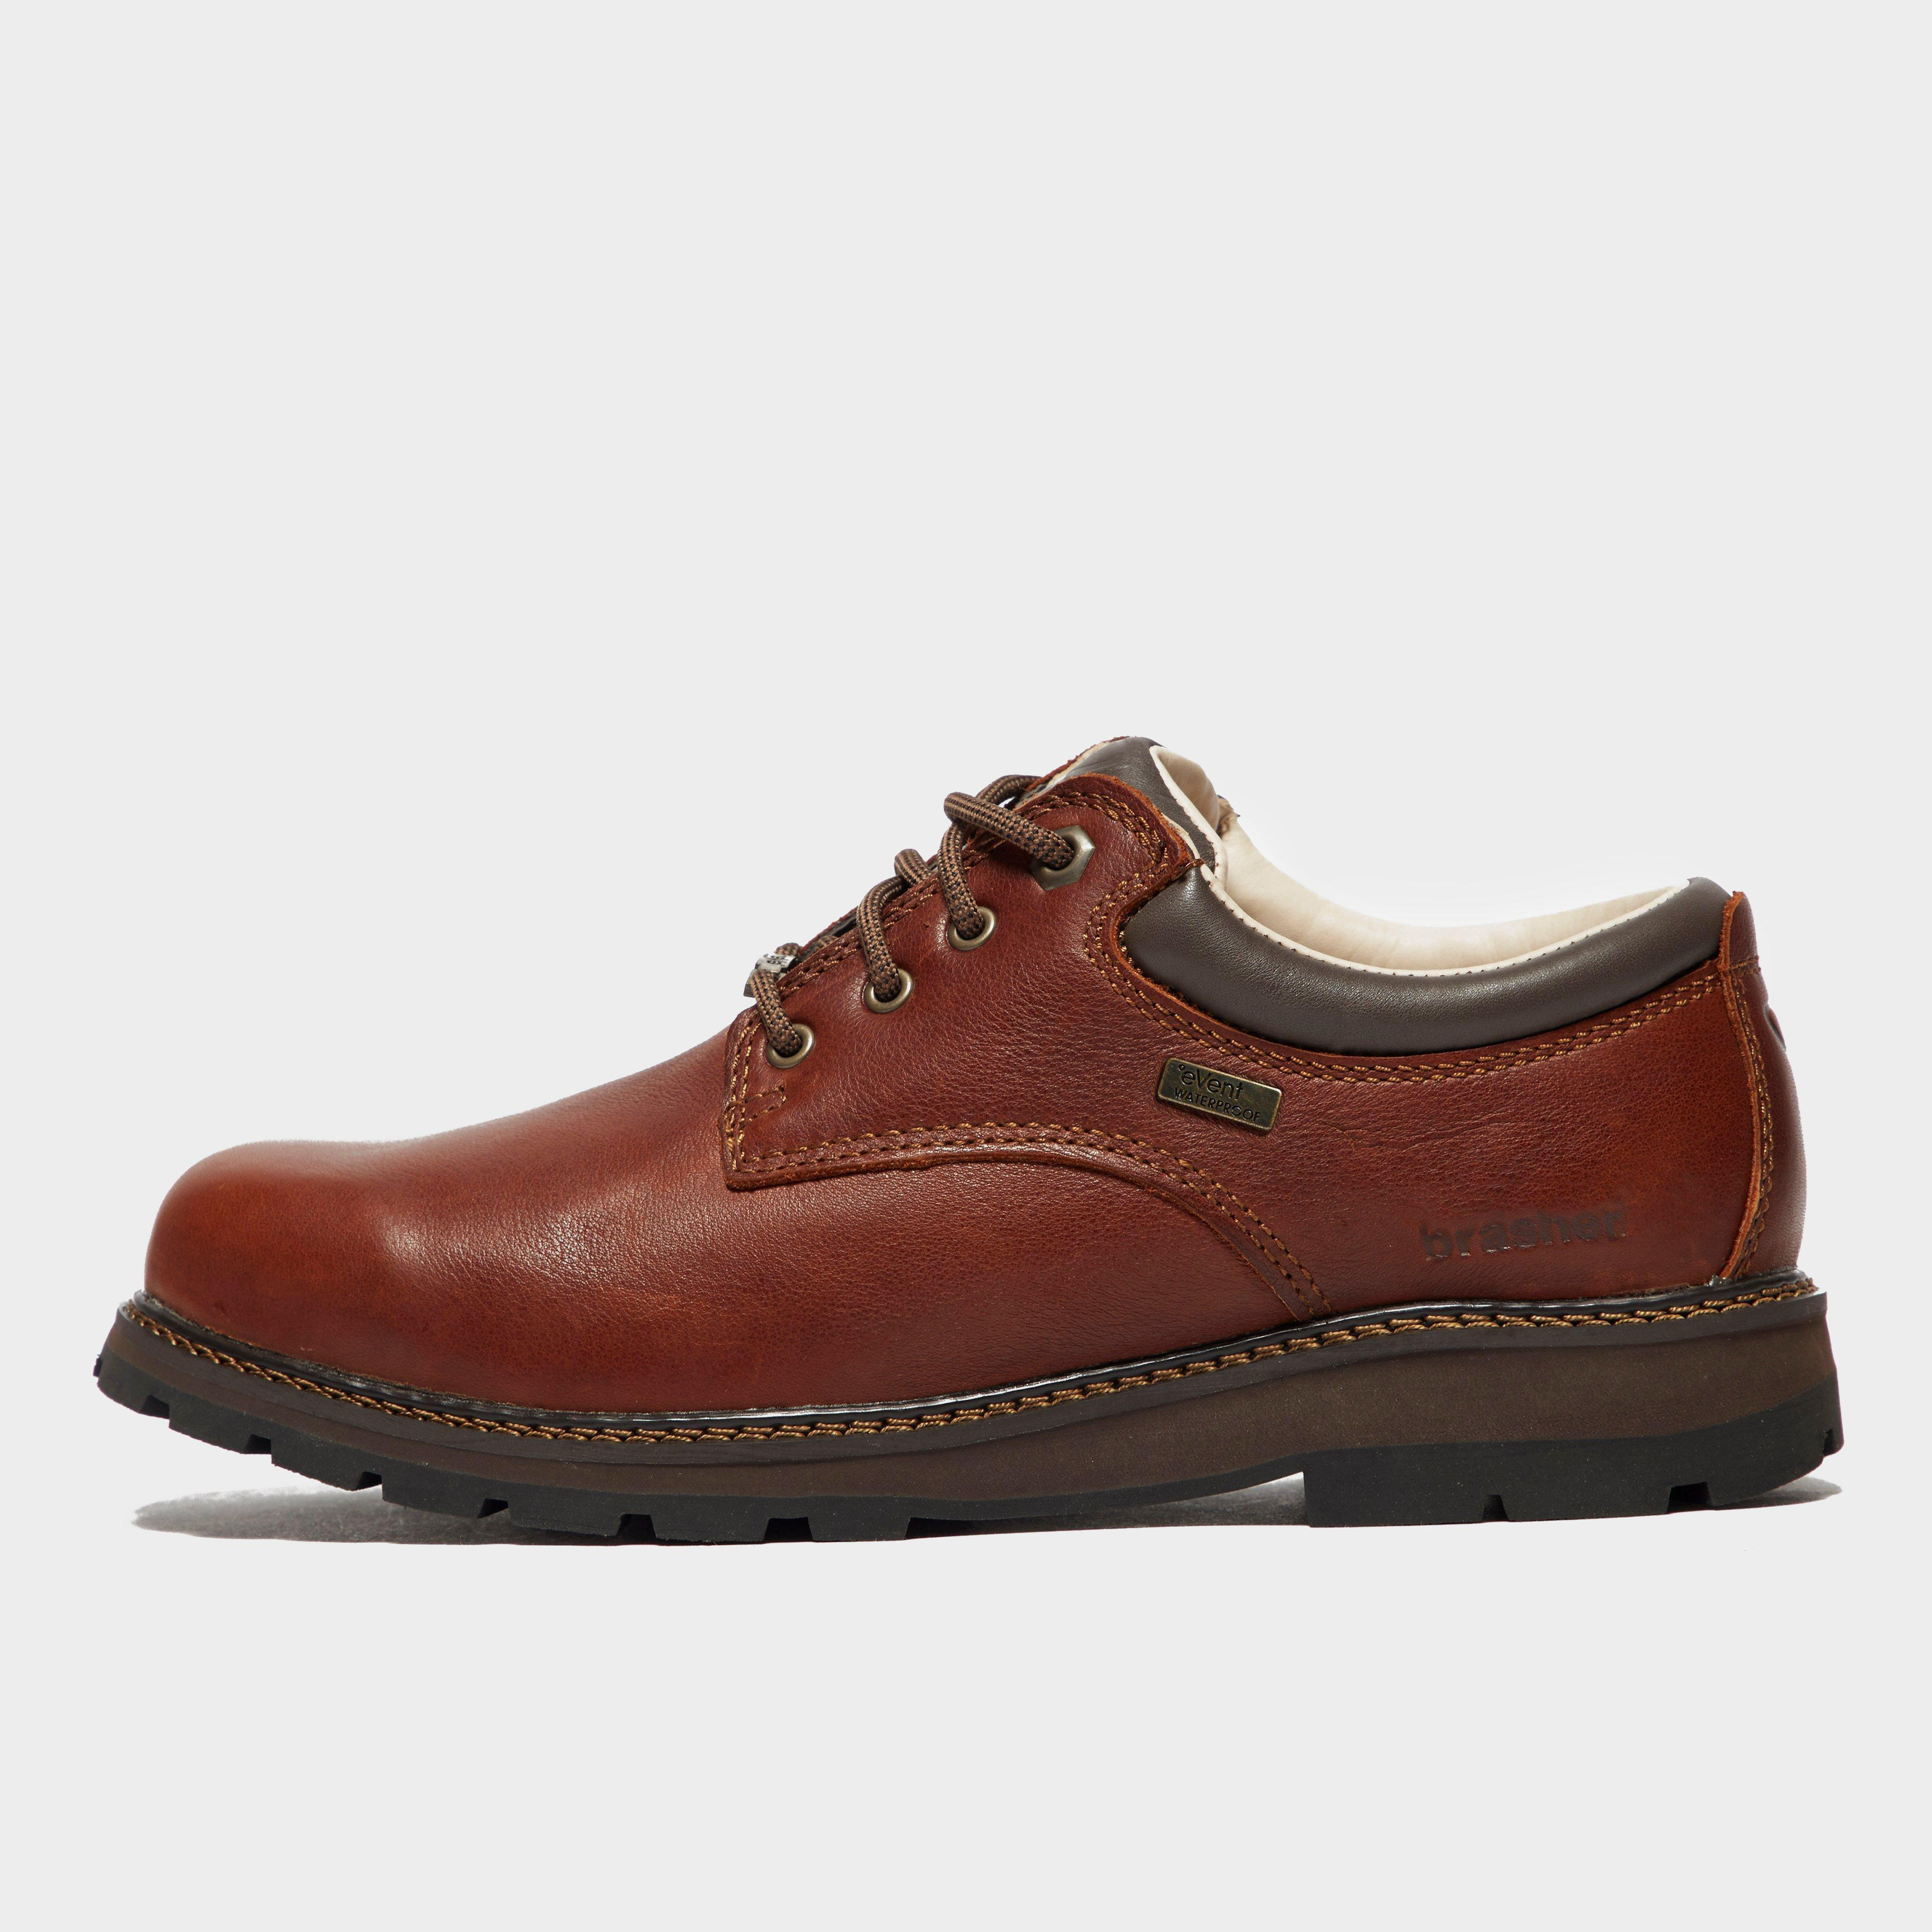 Brasher Mens Country Classic Walking Shoes - Brown/brn  Brown/brn